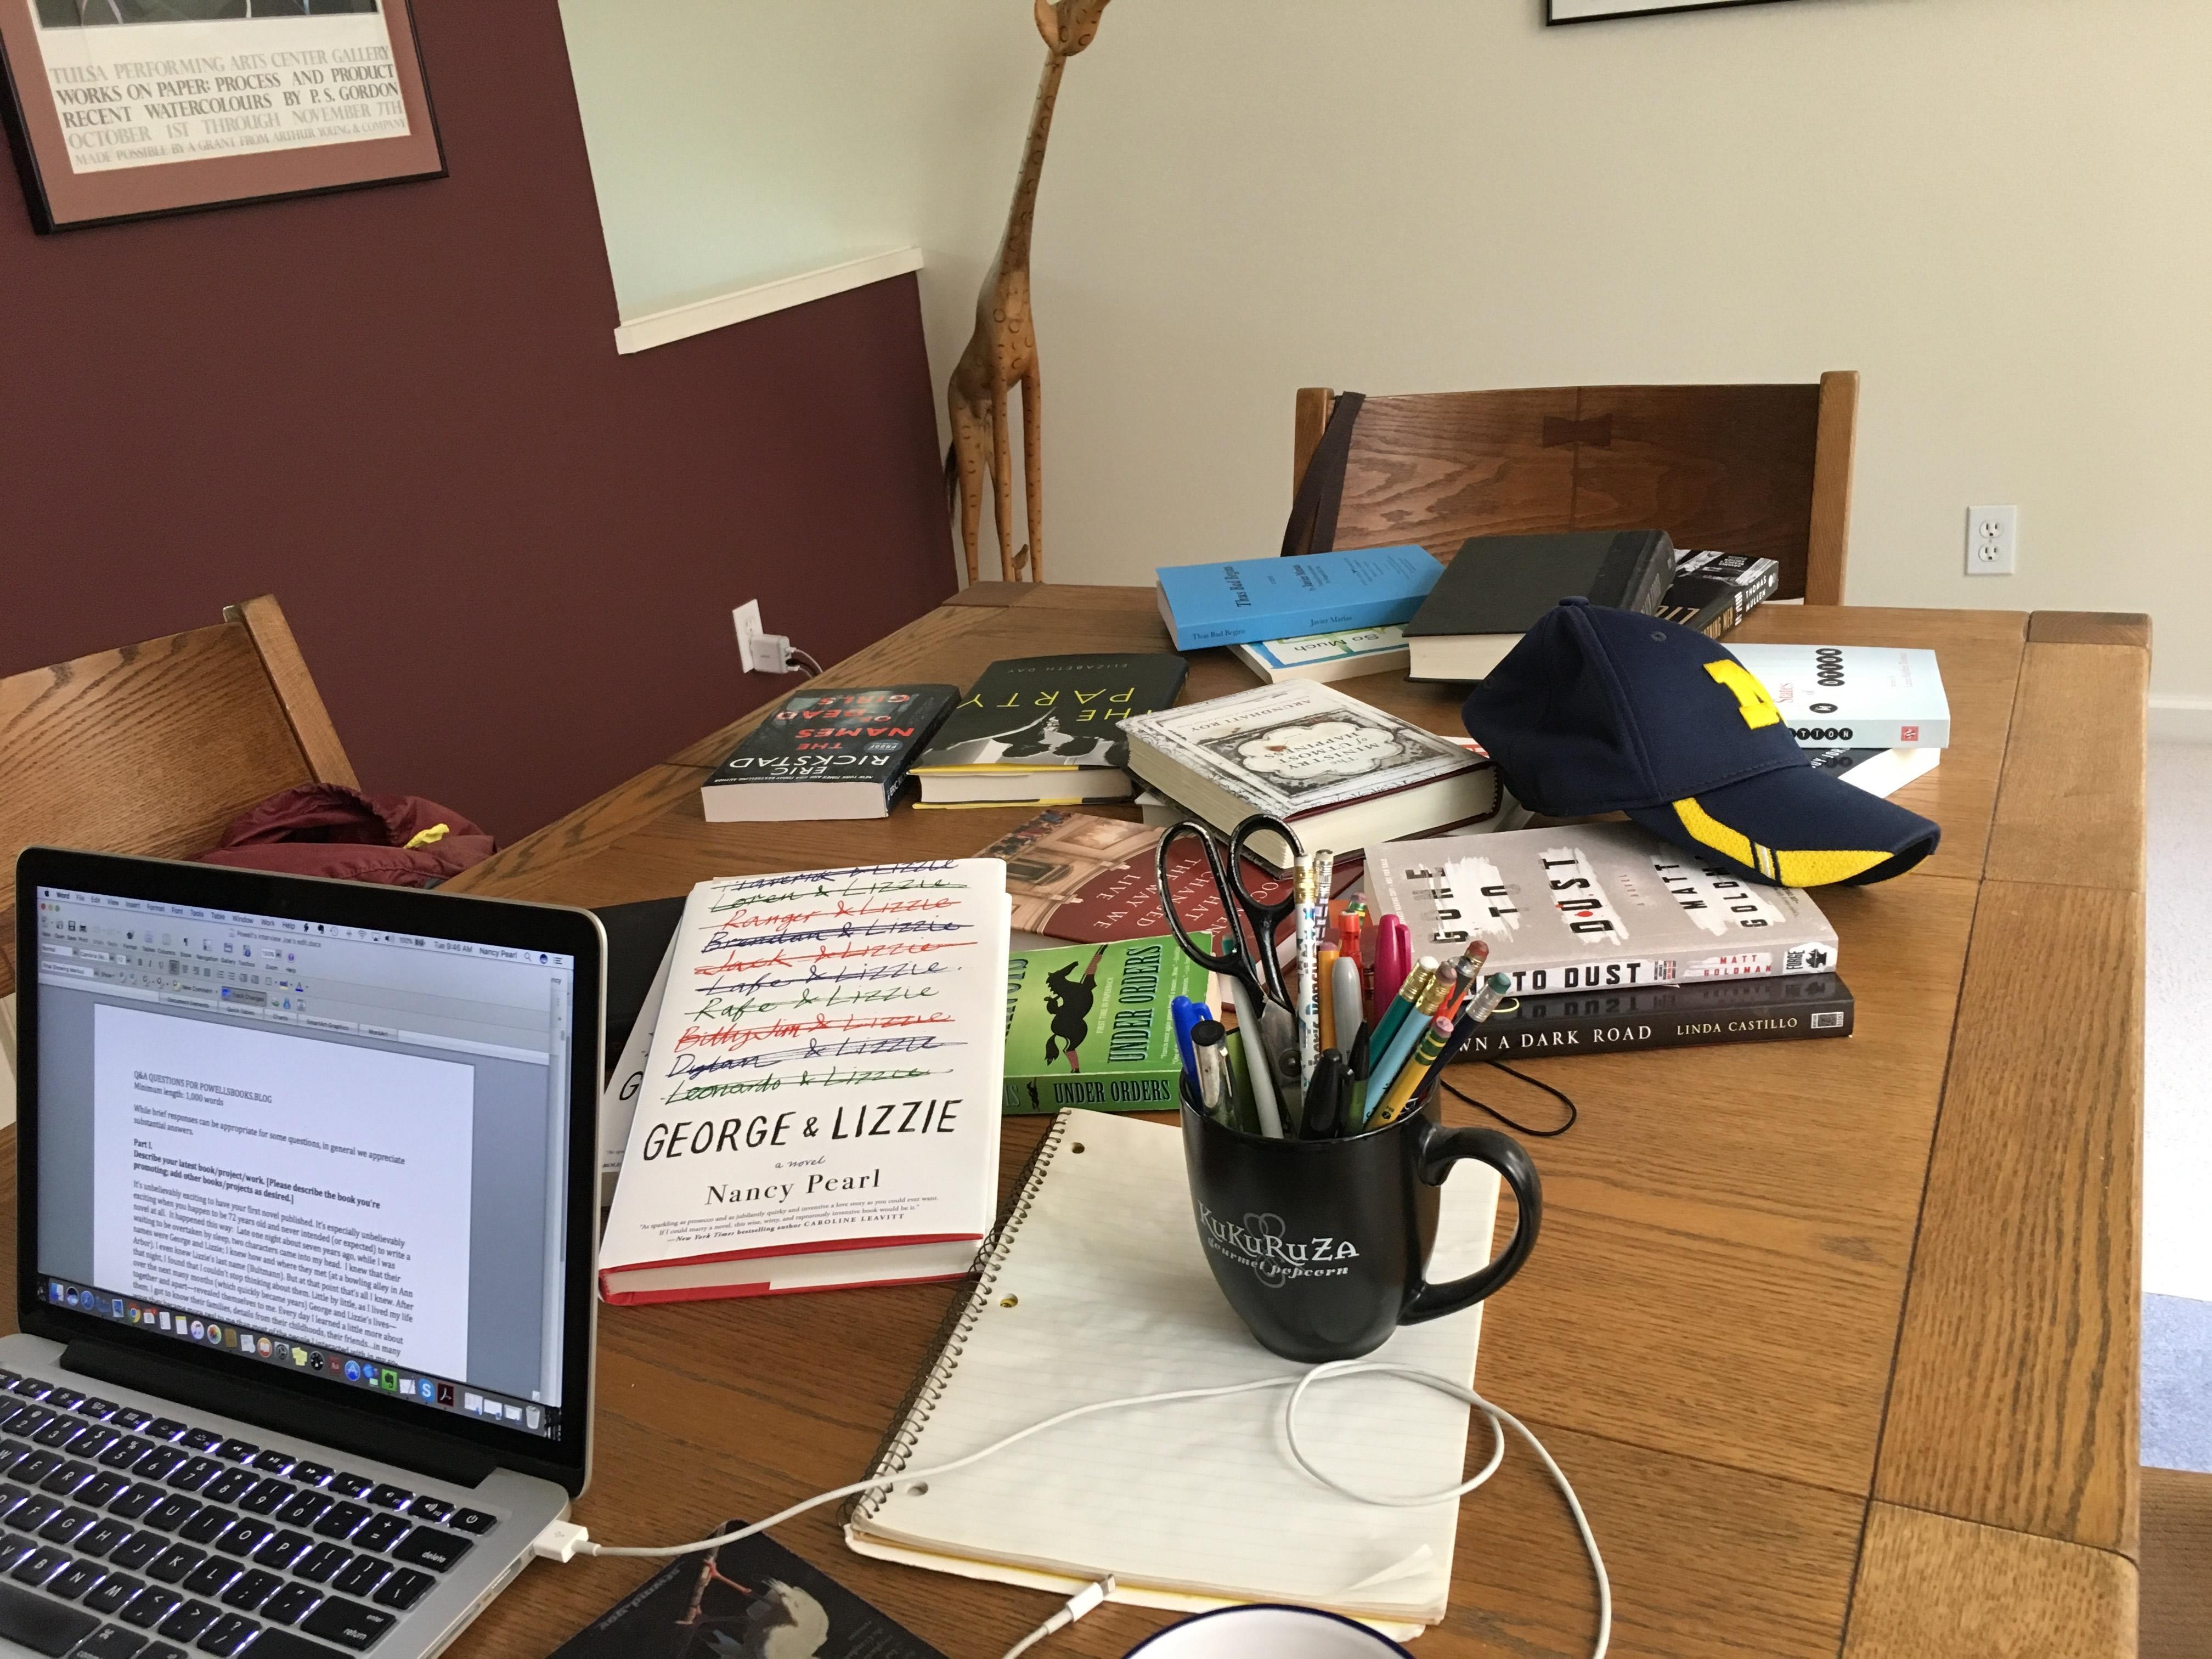 IMG: Nancy Pearl's workspace.